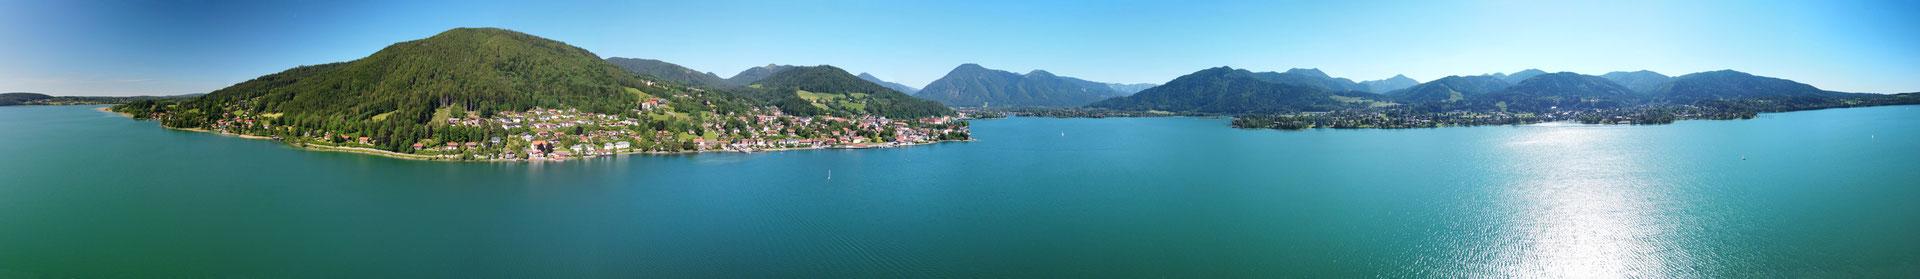 Panorama - Drohnenfoto - Landschaft - Bayern - Berge - Alpen - Sommer - Ausflug - Sonnenuntergang - Wanderung - Tegernsee